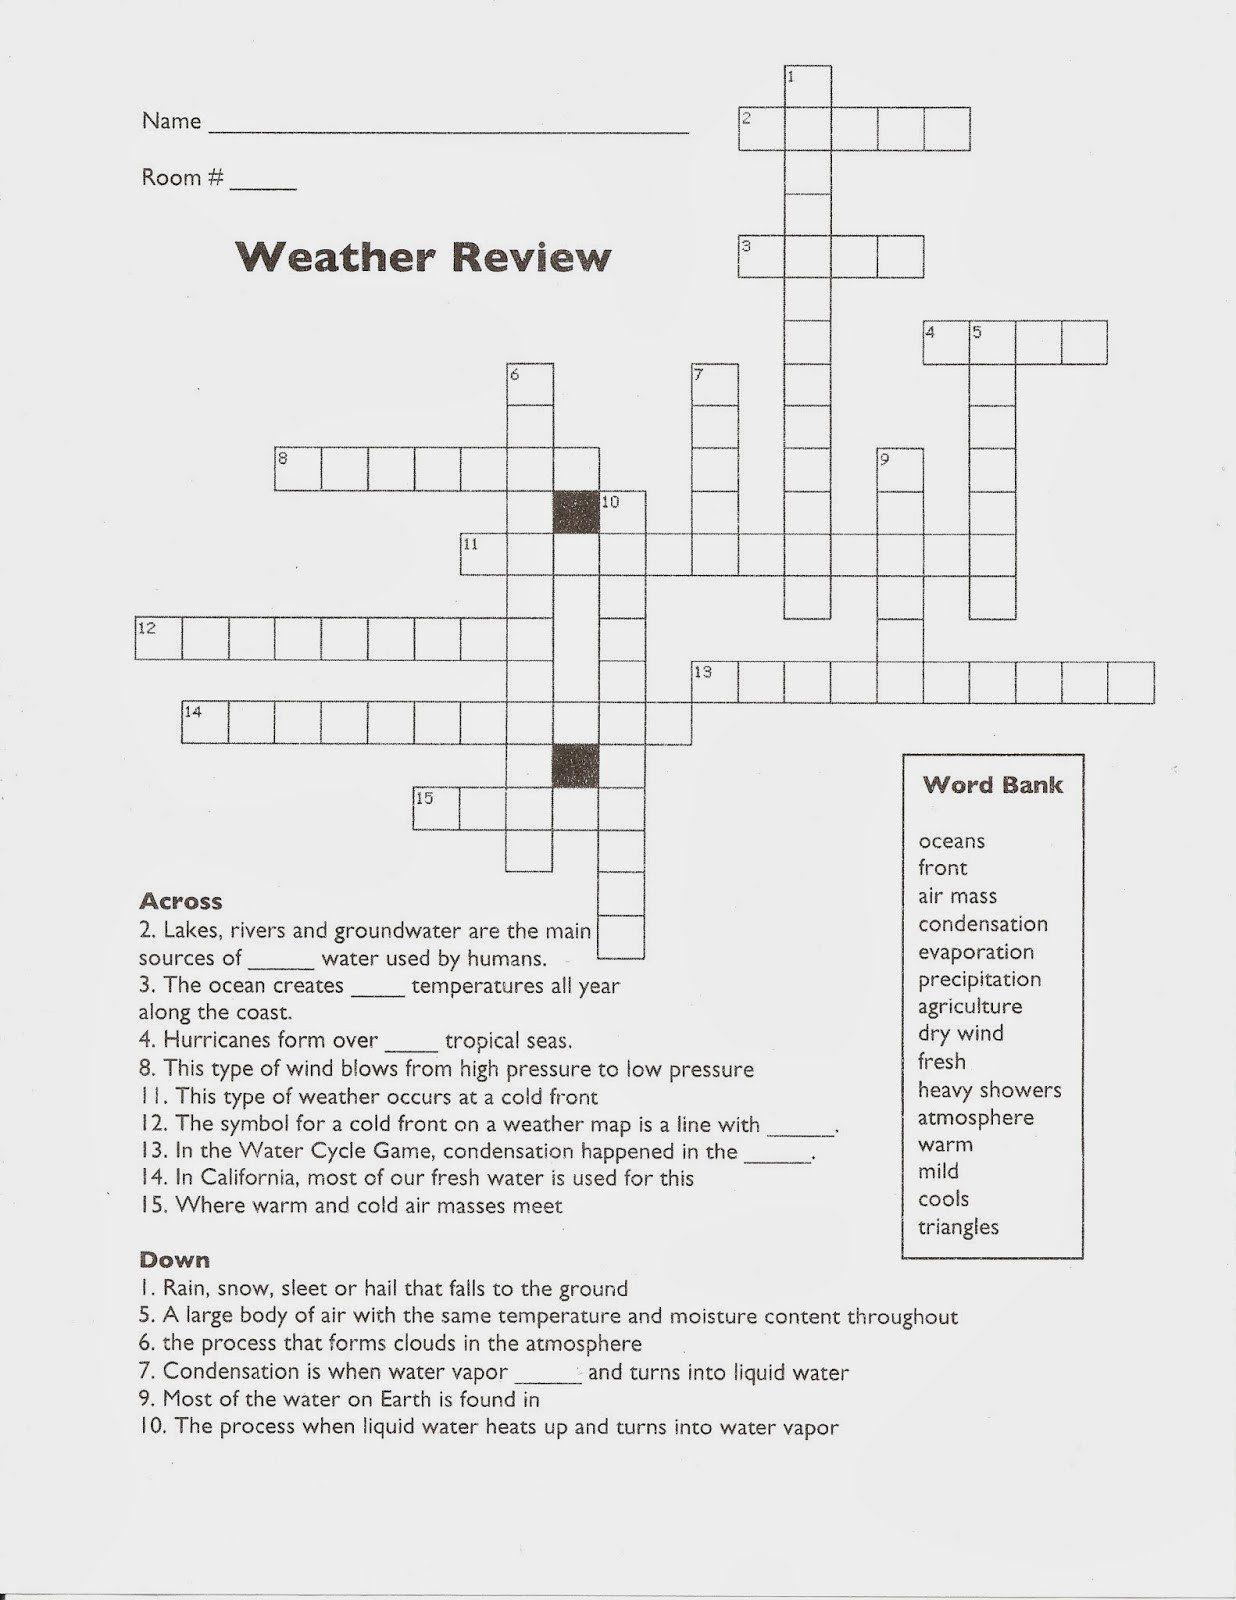 5th Grade Science Weather Worksheets Weather Worksheet New 696 Weather Climate Worksheets 5th Grade In 2020 Weather Worksheets 5th Grade Worksheets Landforms Worksheet